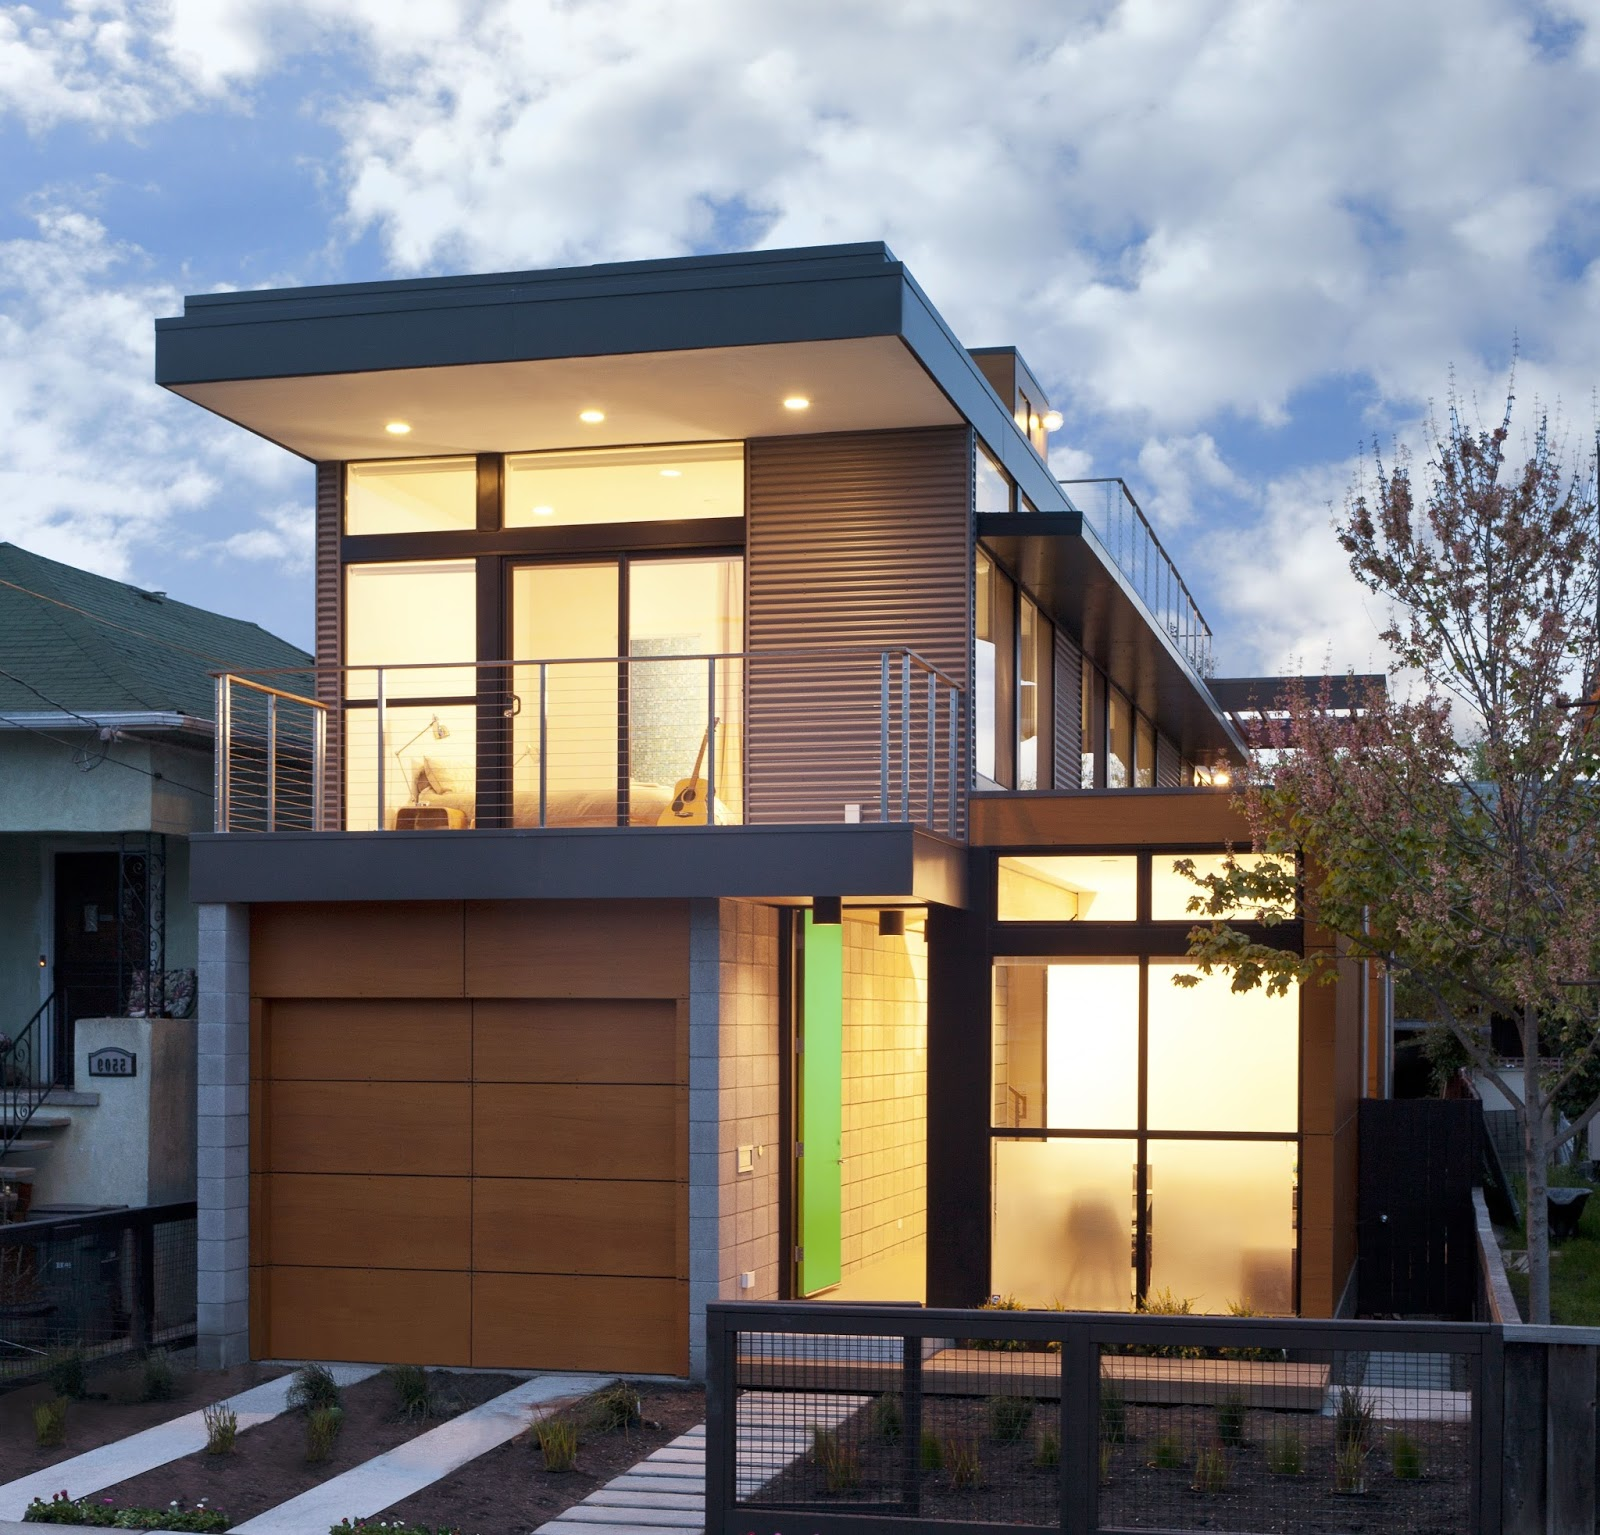 65 imagenes de fachadas de casas modernas minimalistas y for Planos casas pequenas modernas